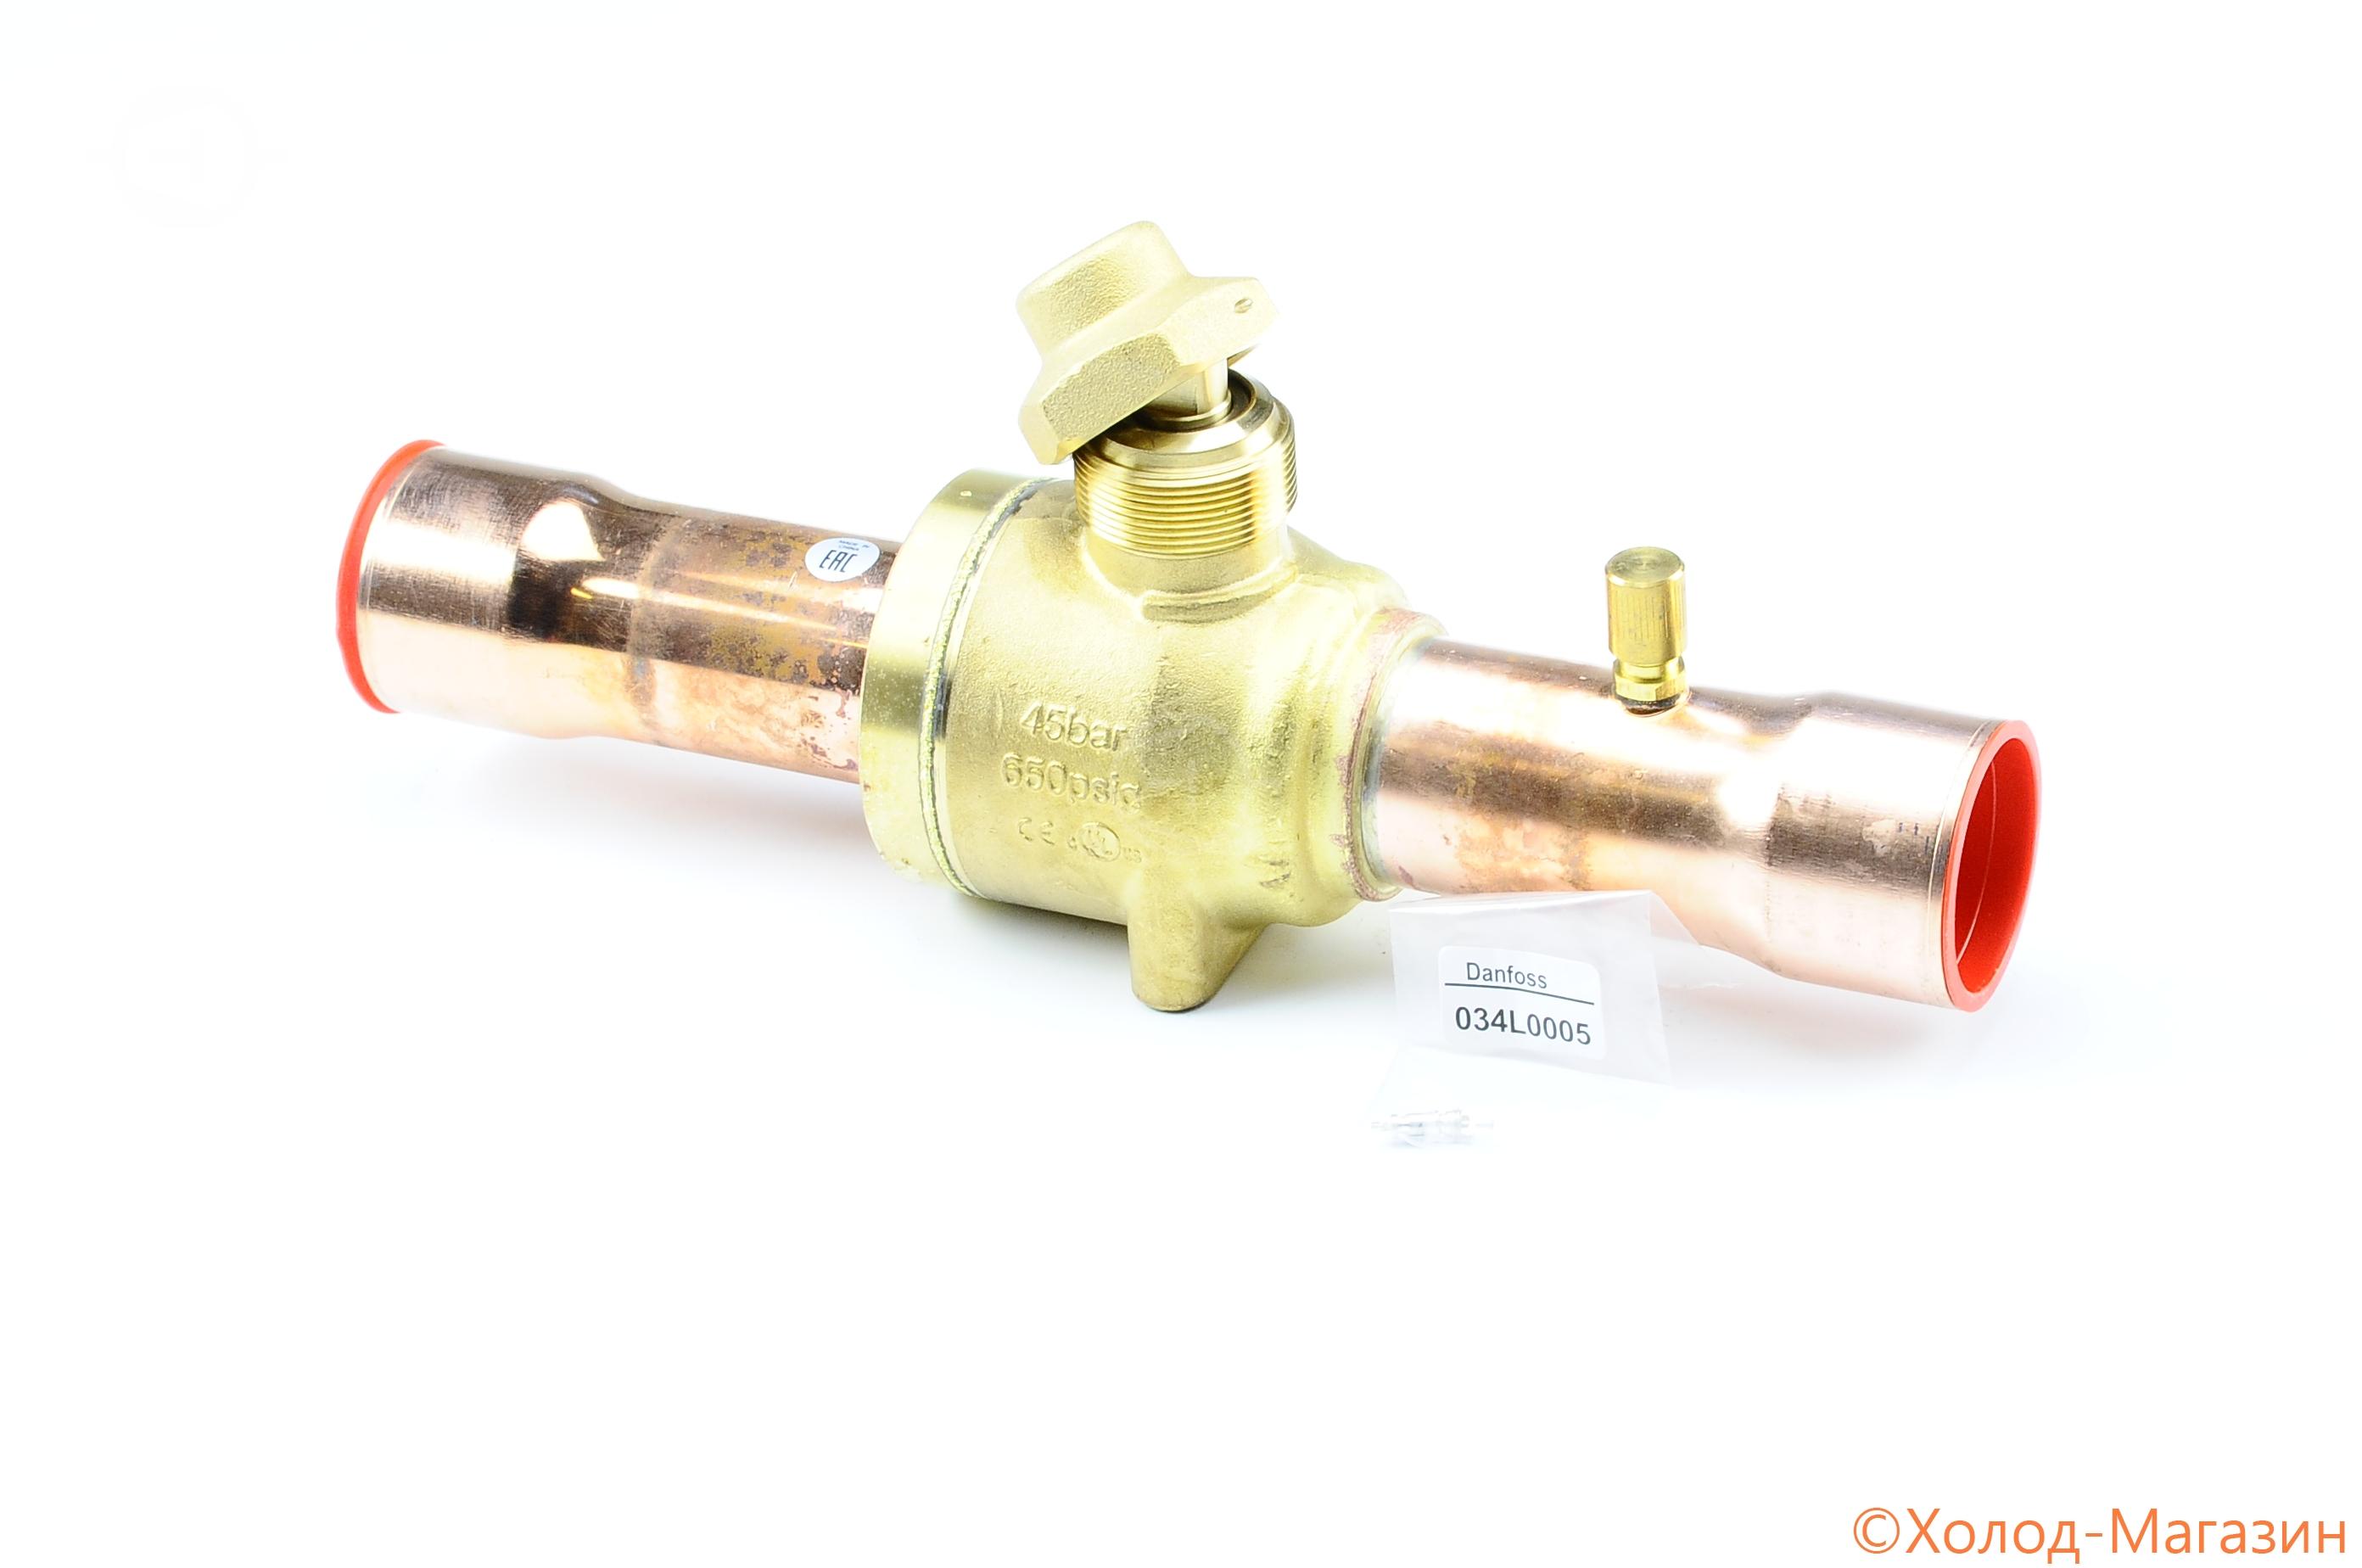 Вентиль шаровой со штуцером GBC 42S (42 мм), Danfoss